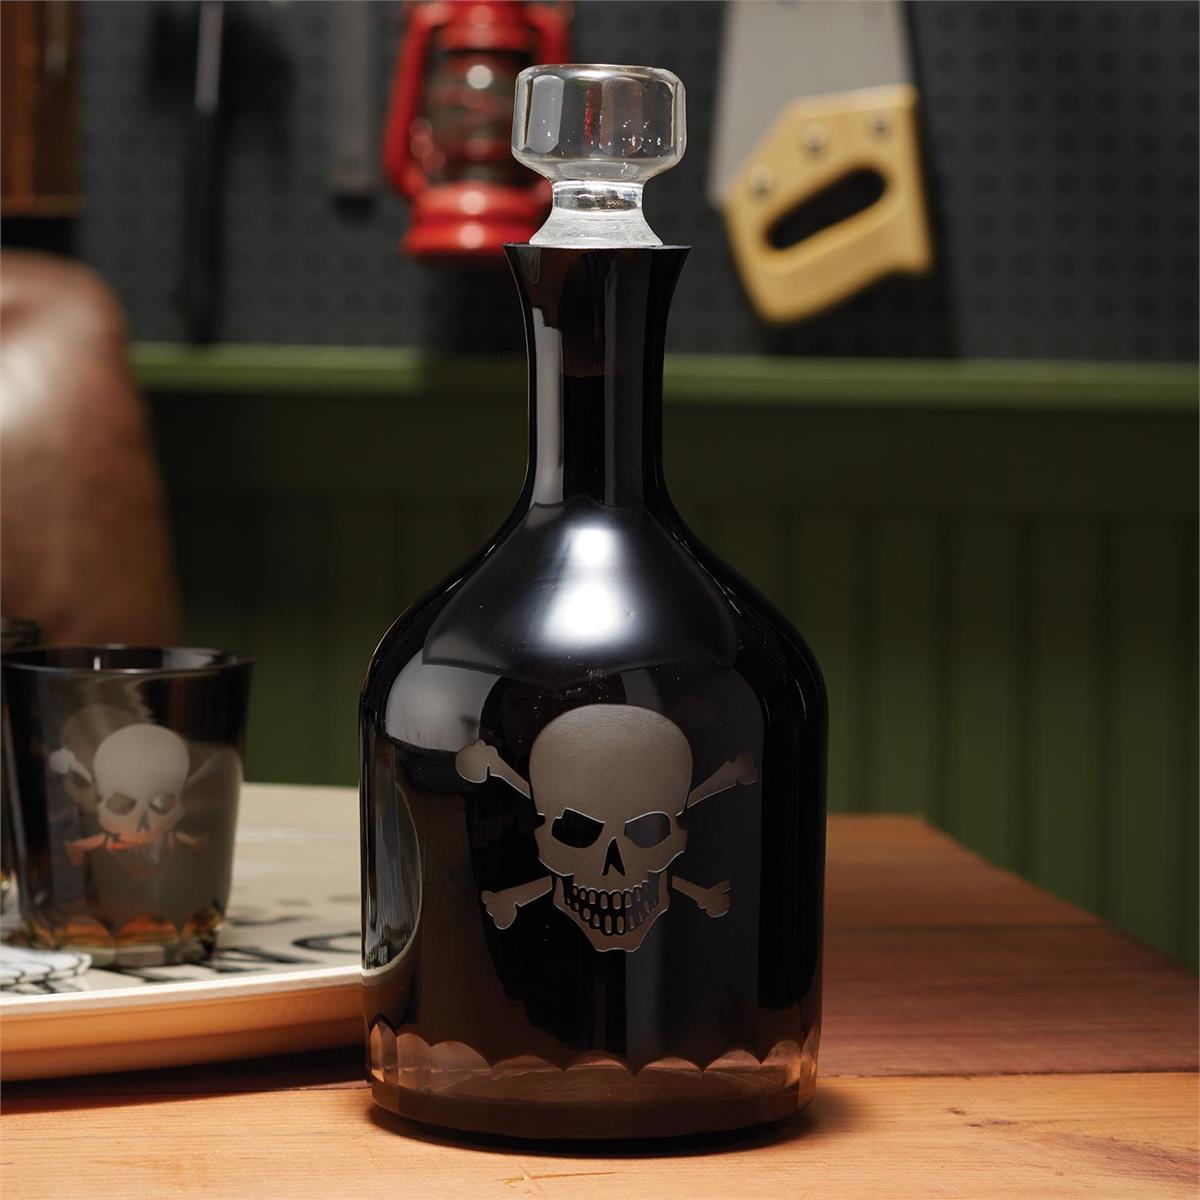 Skull & Crossbones Glass Decanter